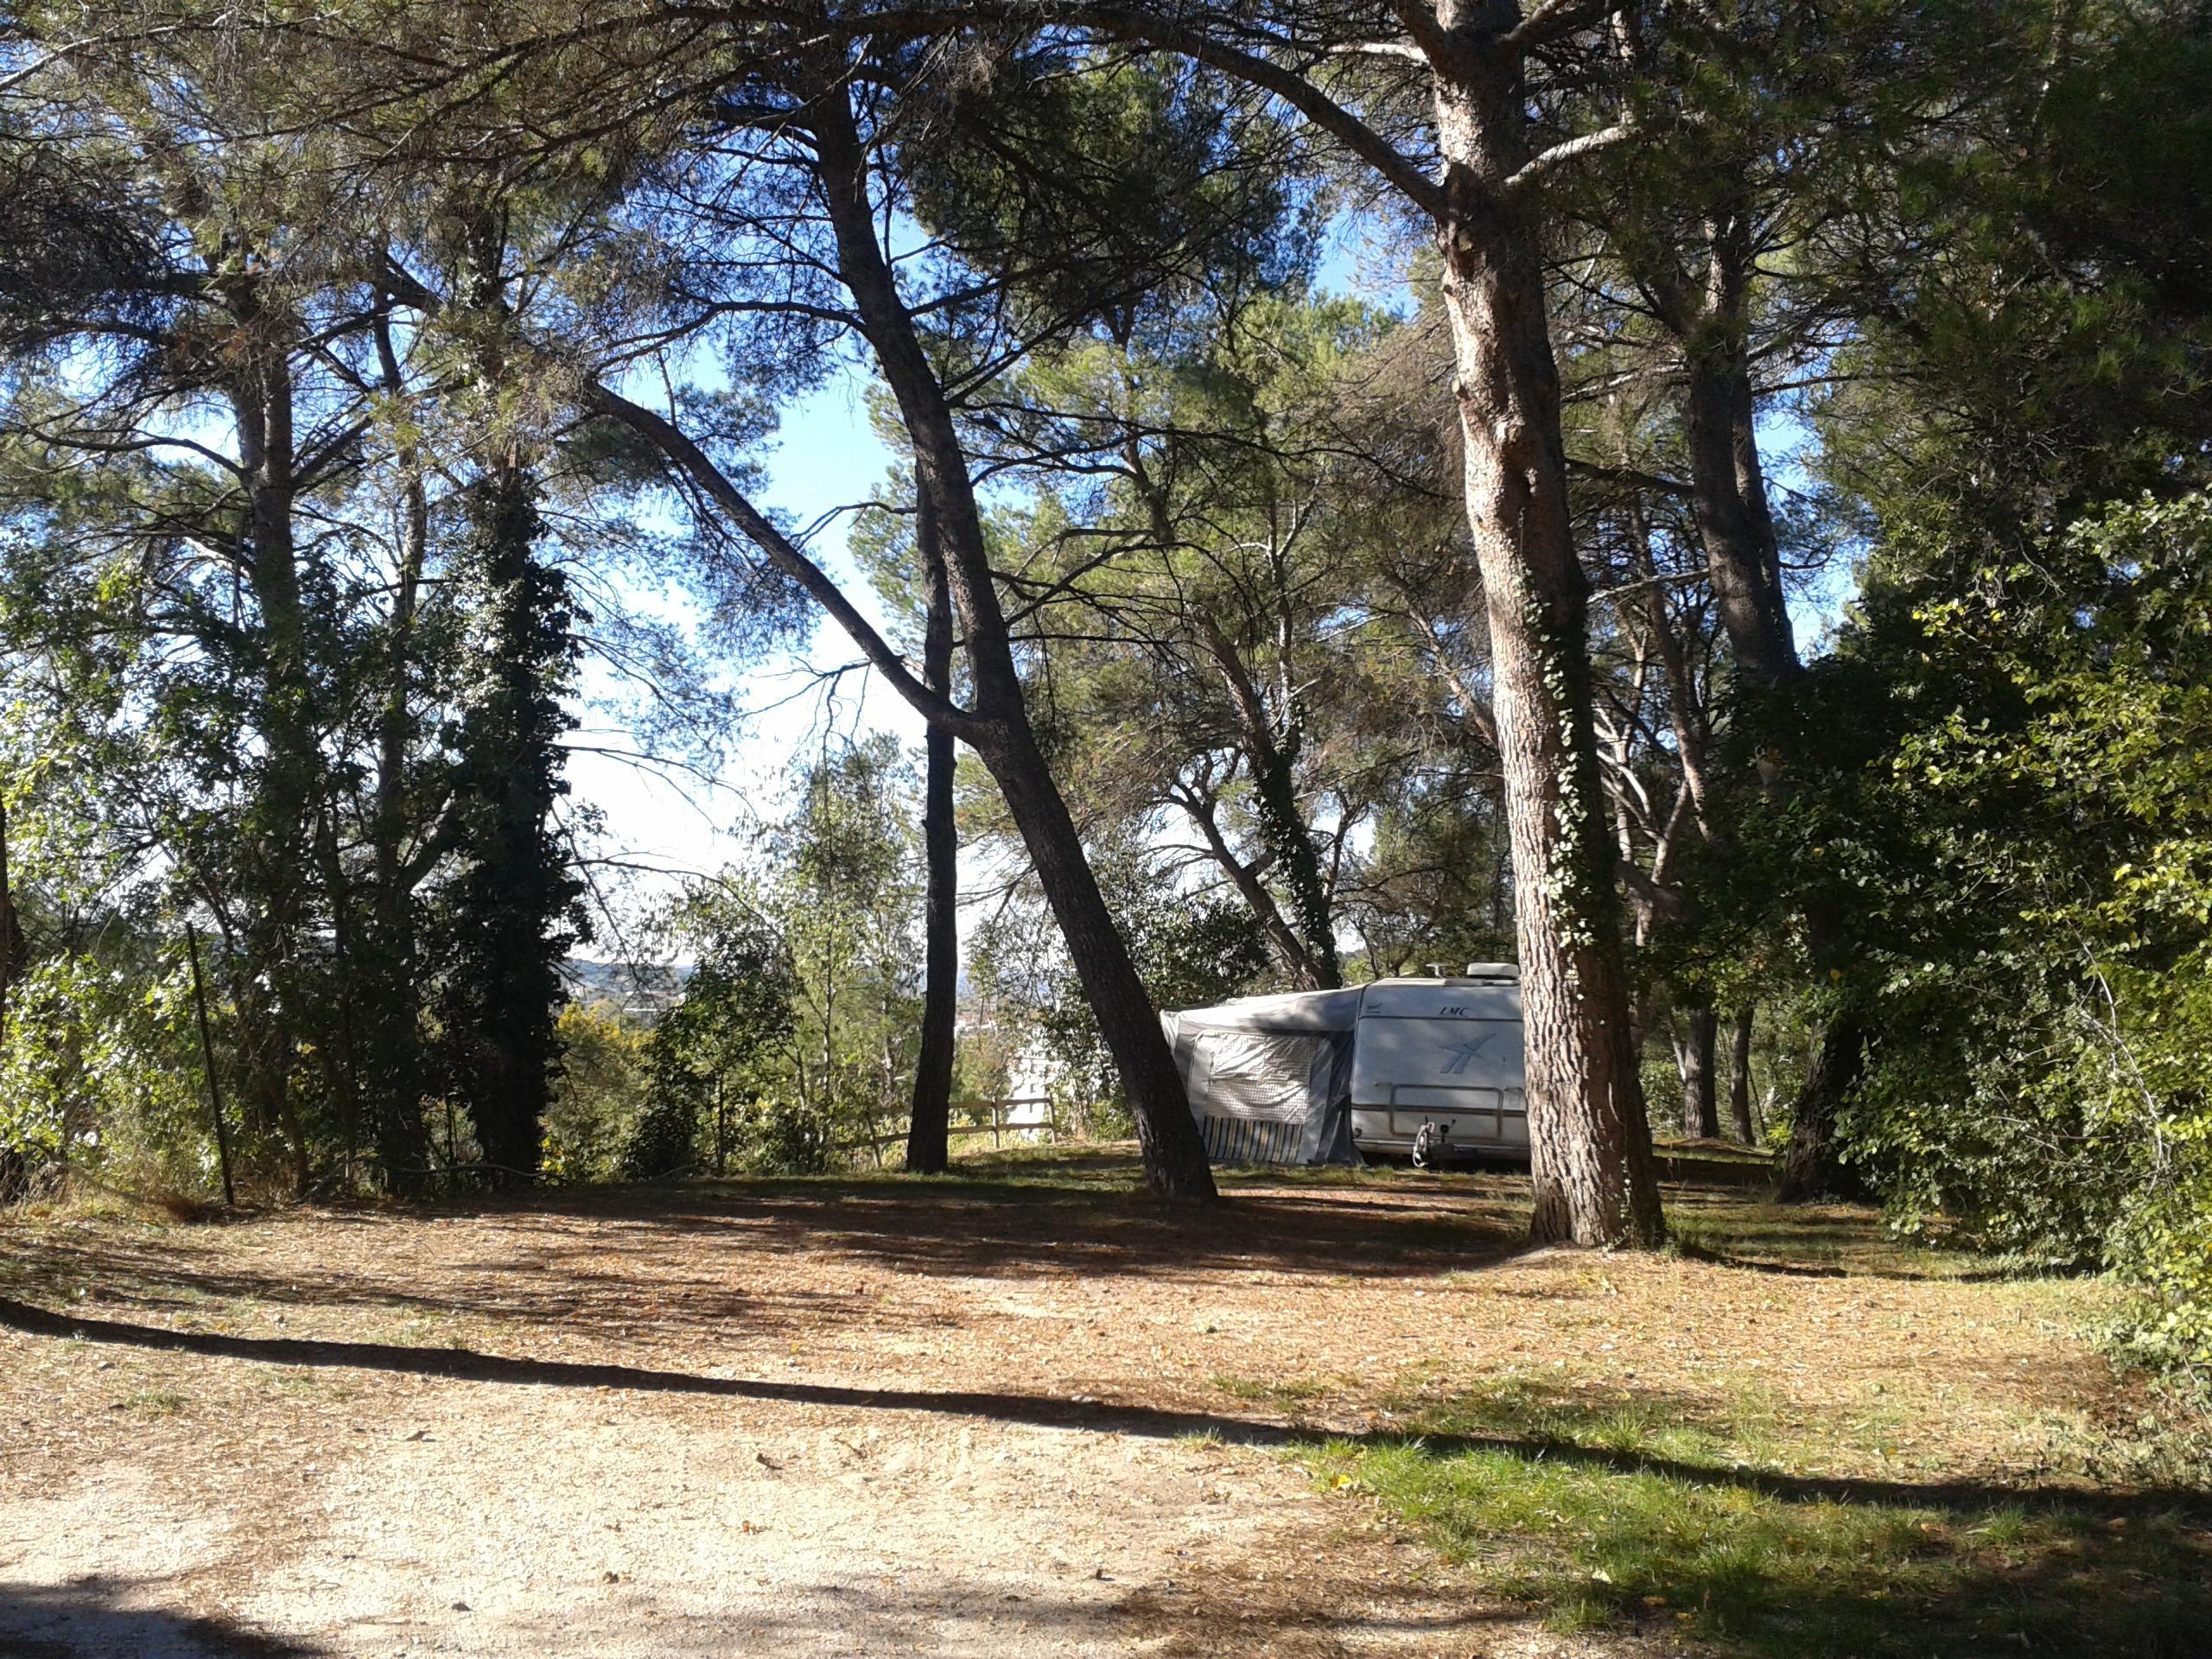 Camping Chantecler, Aix-en-Provence, Bouches-du-Rhône